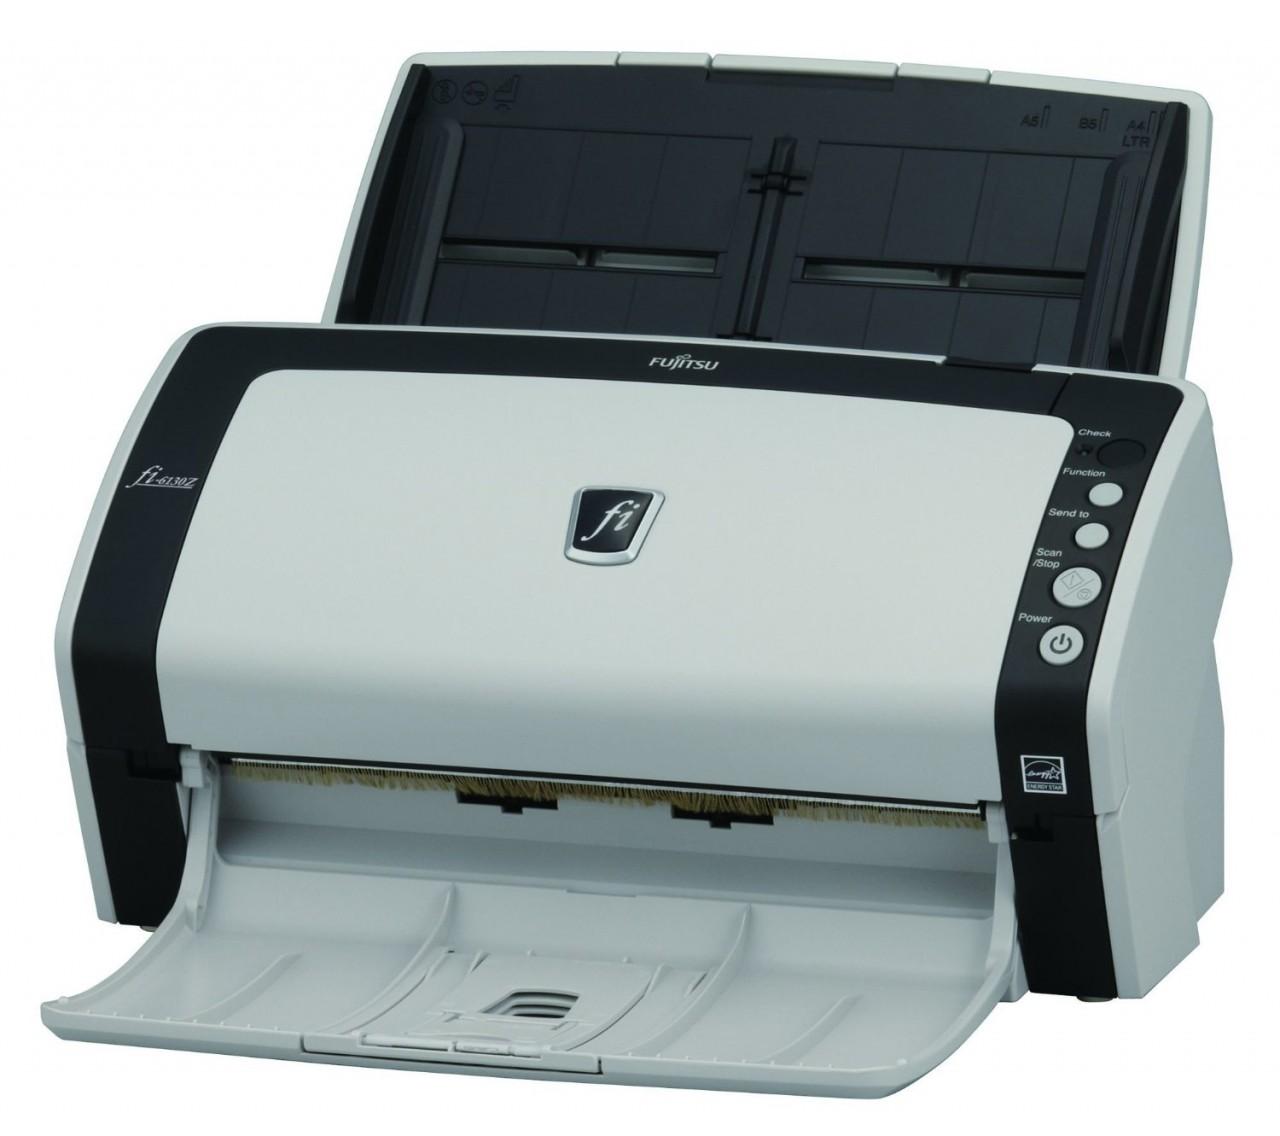 fujitsu fi6130z duplex sheetfed document scanner price in With sheetfed document scanner